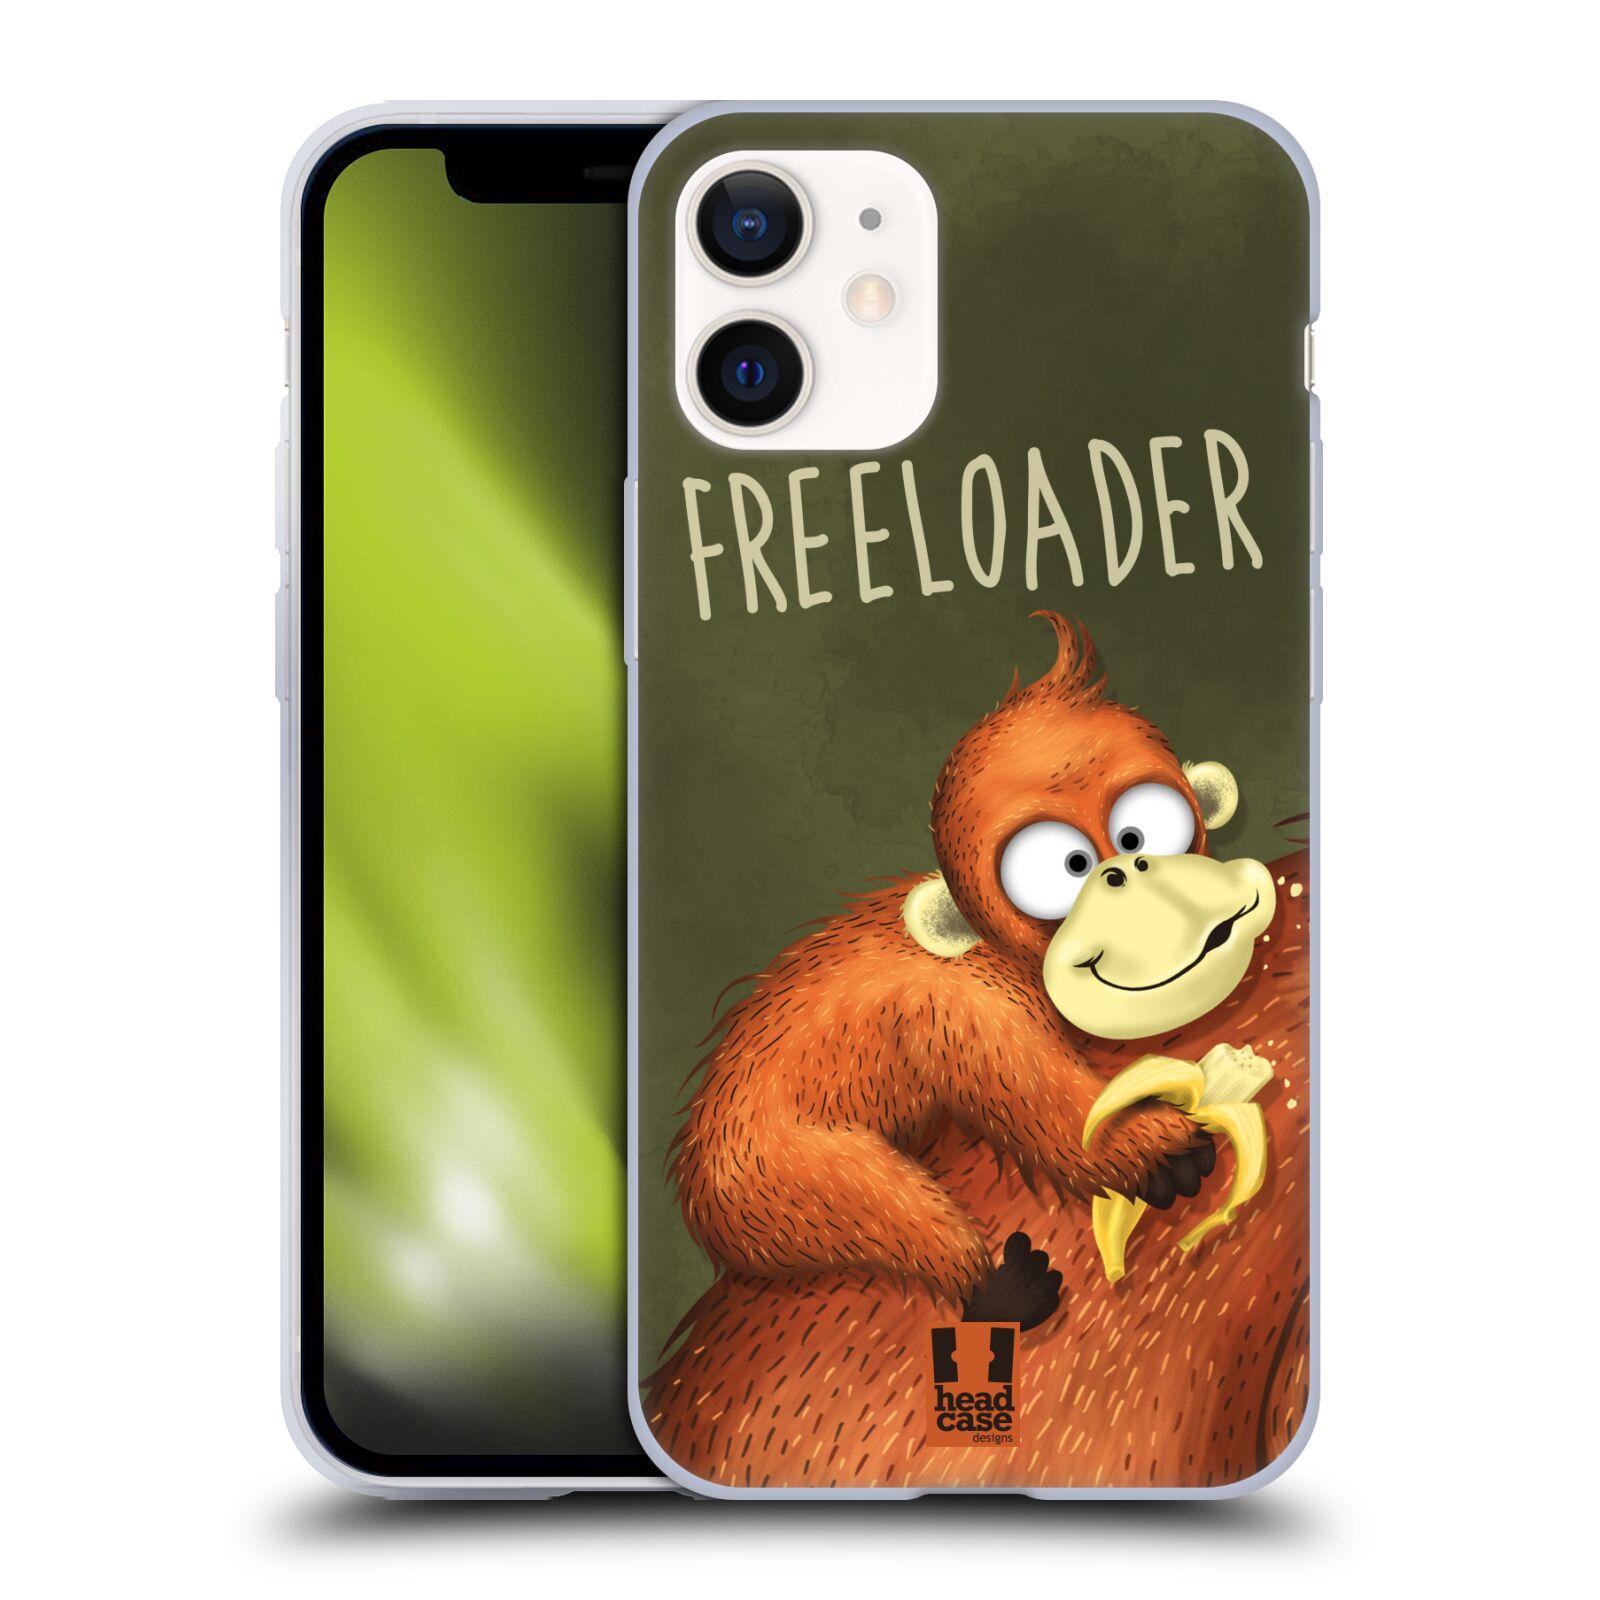 Silikonové pouzdro na mobil Apple iPhone 12 Mini - Head Case - Opičák Freeloader